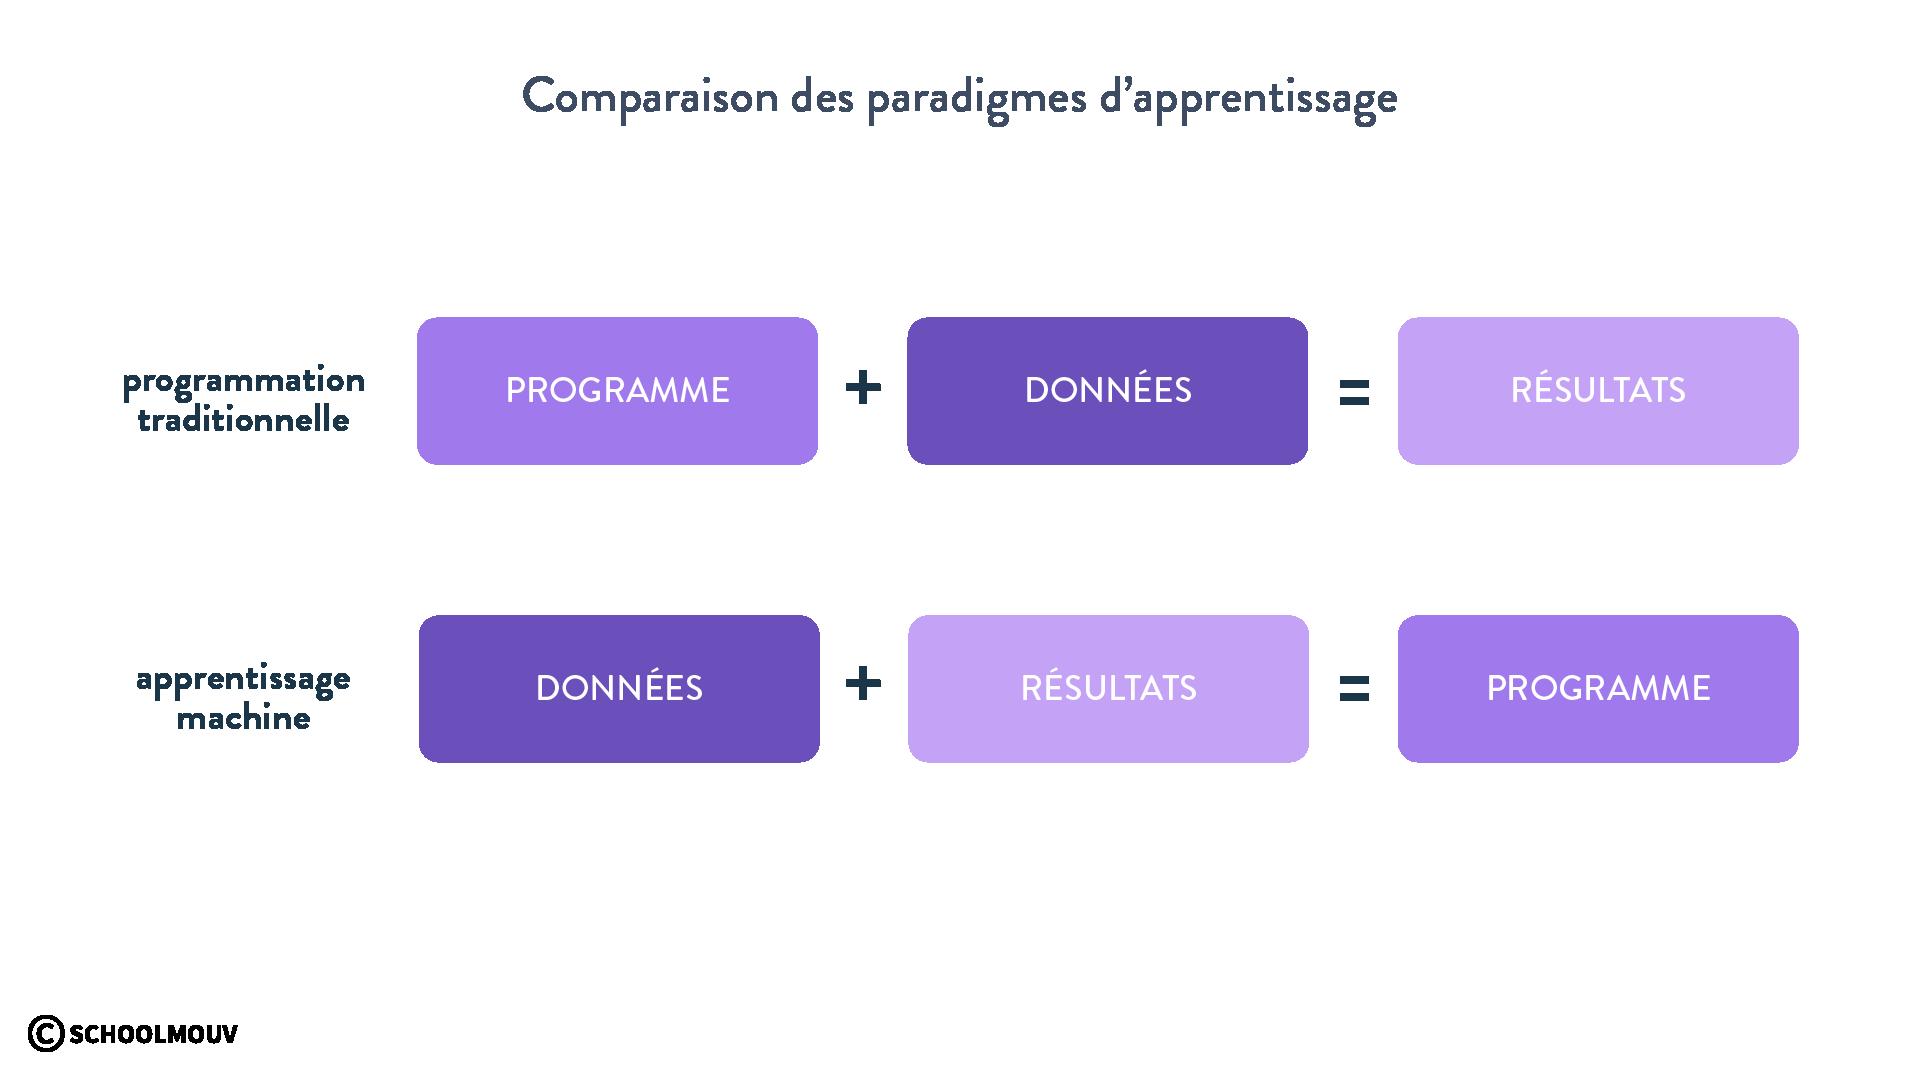 paradigmes d'apprentissage